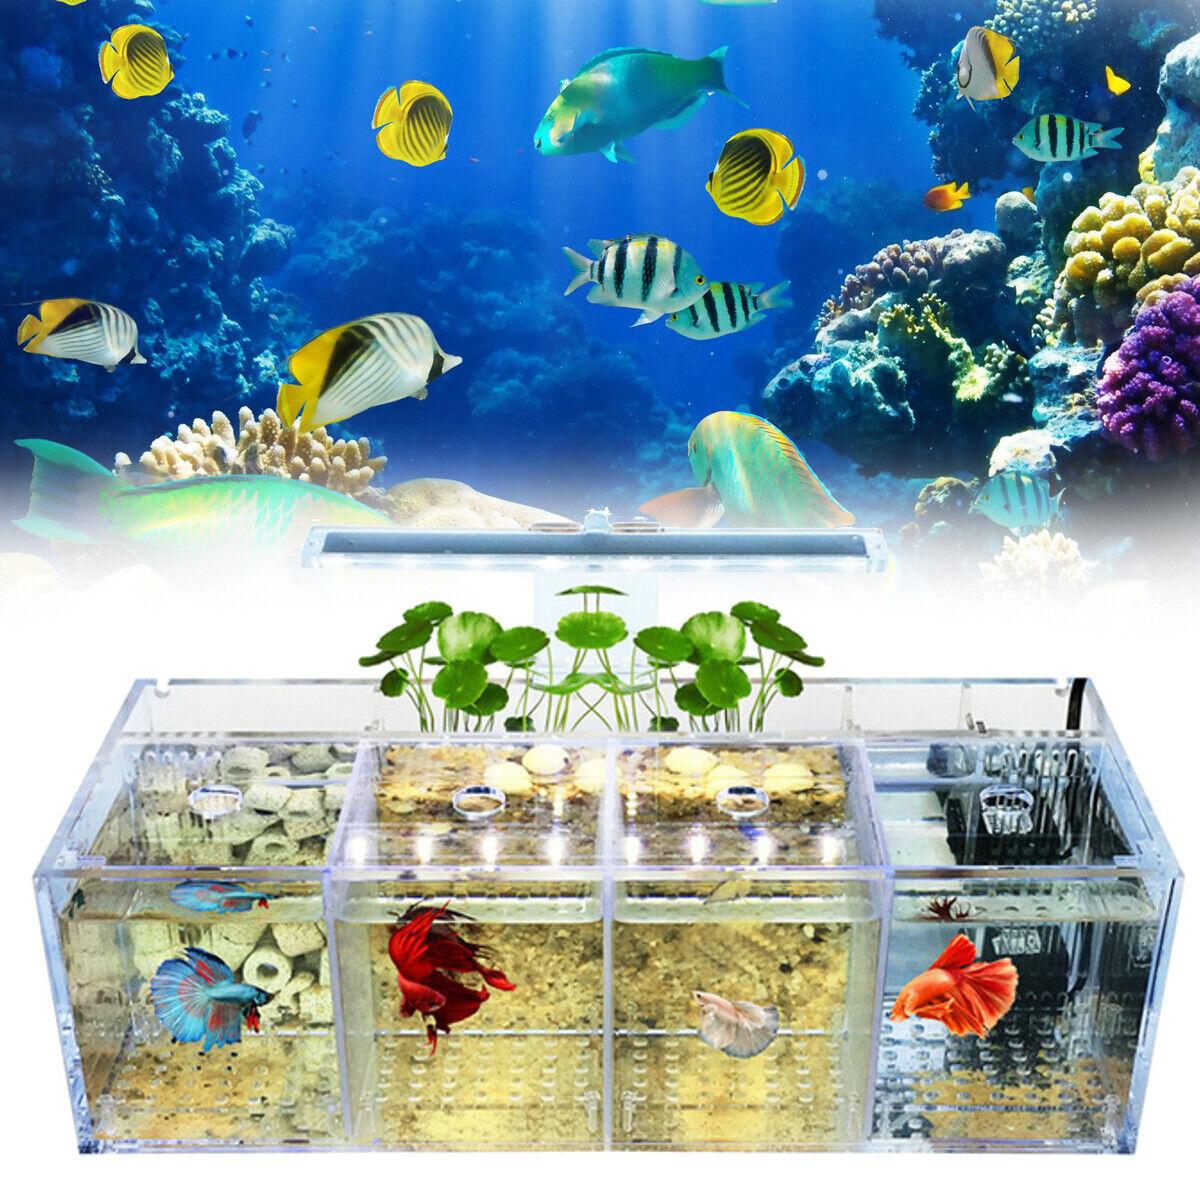 LED Light Acrylic Clear Aquarium Mini Betta Fish Tank Desktop Water Pump Filter